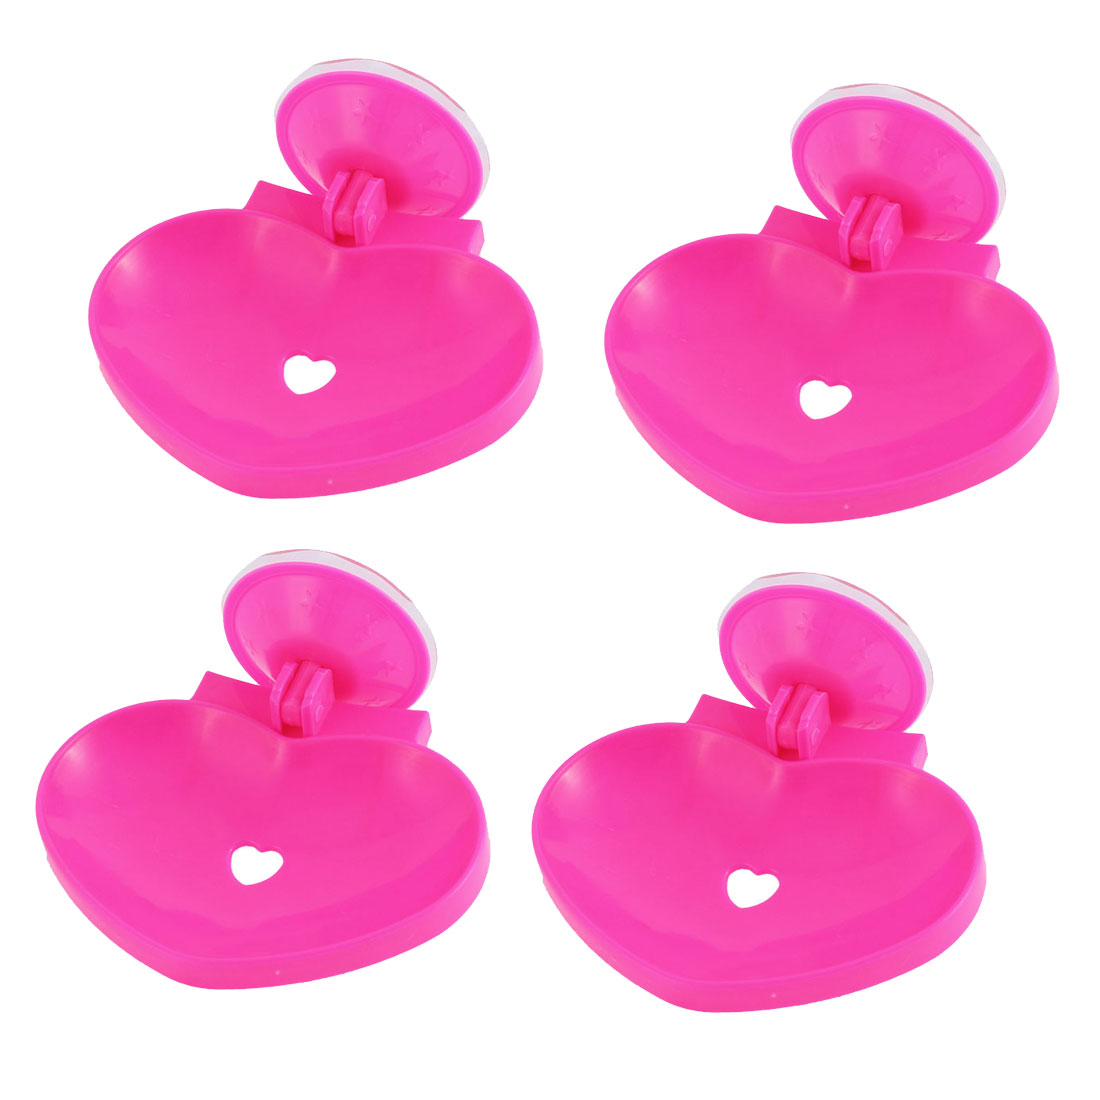 Bathroom Plastic Heart Design Hollow Out Suction Cup Soap Holder Fuchsia 4 Pcs